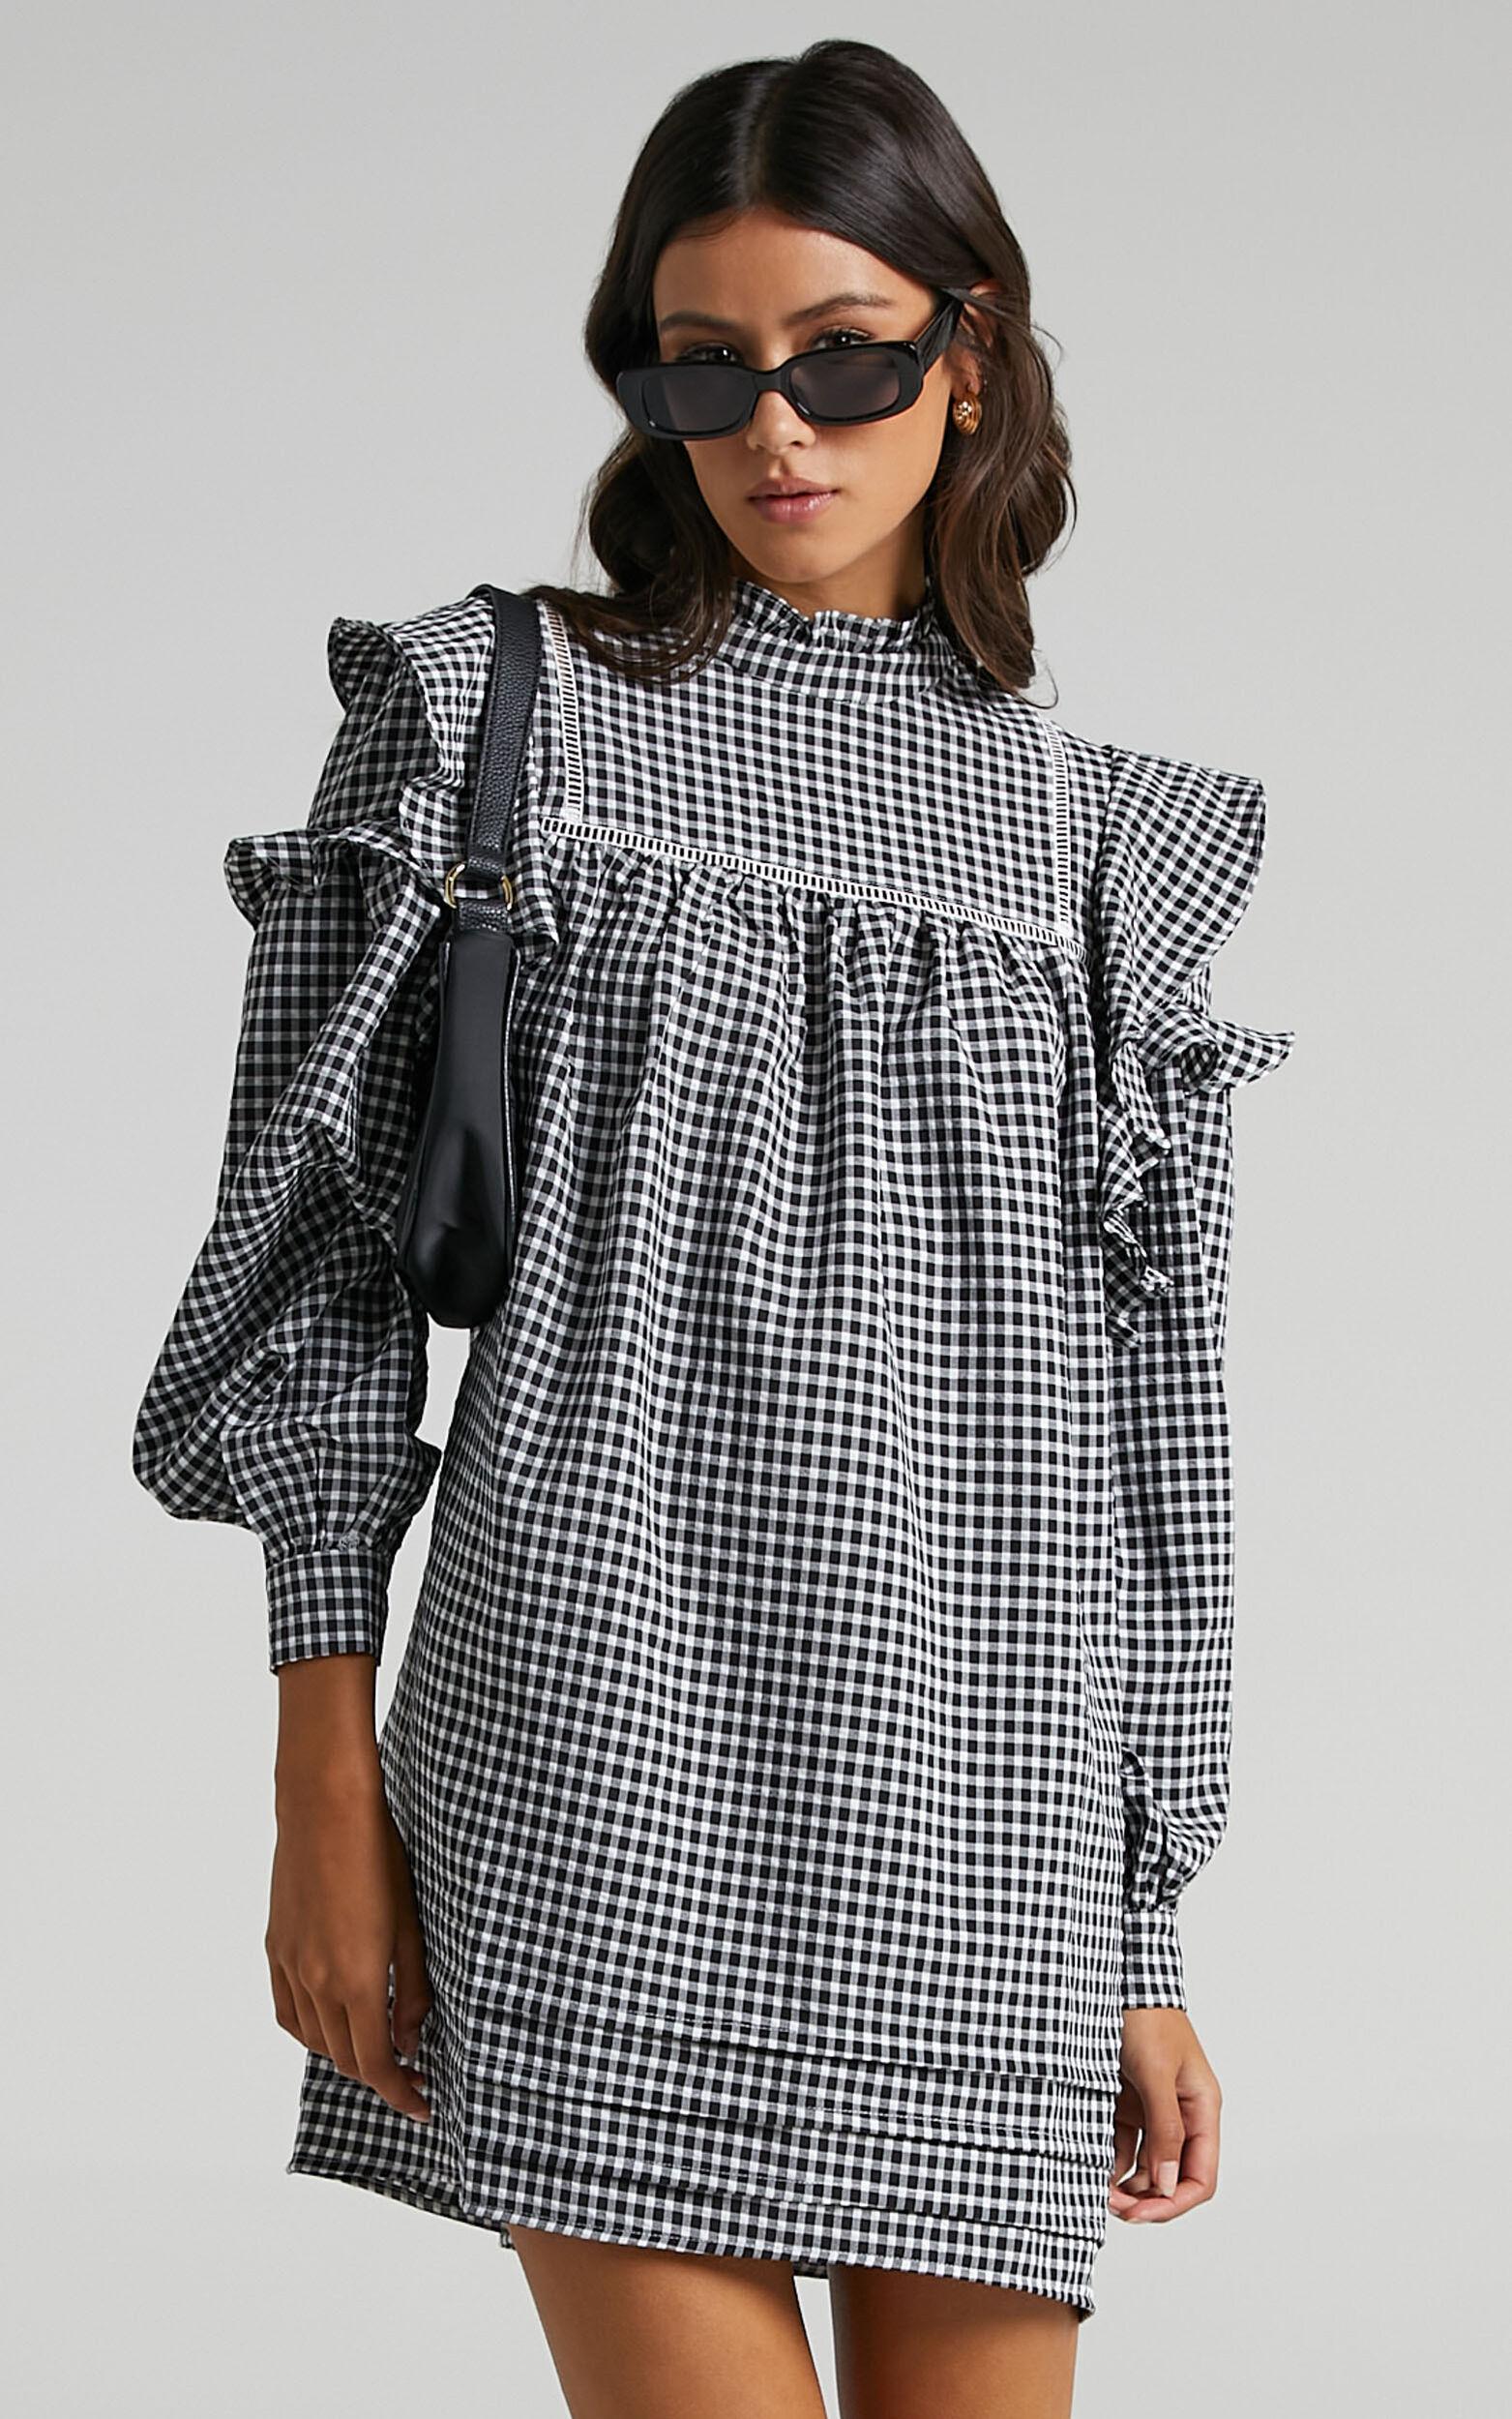 Adalia Dress in Black Check - 04, BLK1, super-hi-res image number null